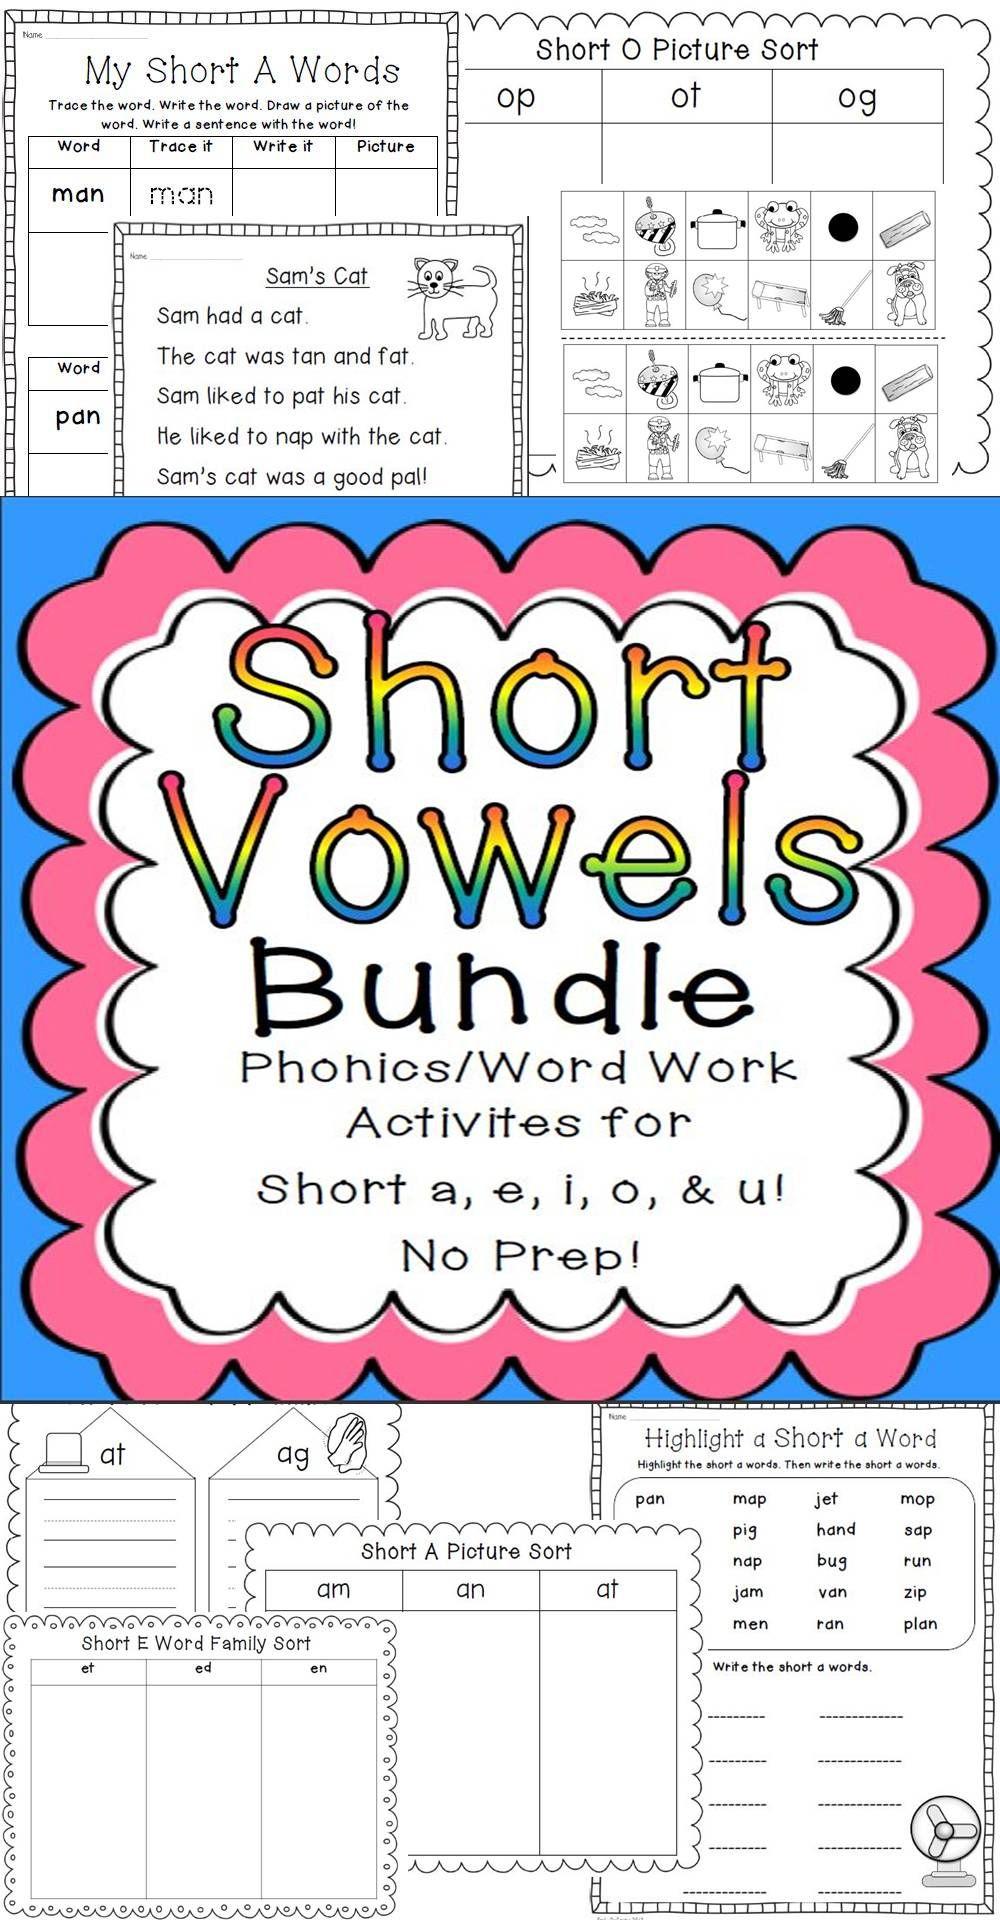 Short Vowels Bundle! Phonics/Word Work.